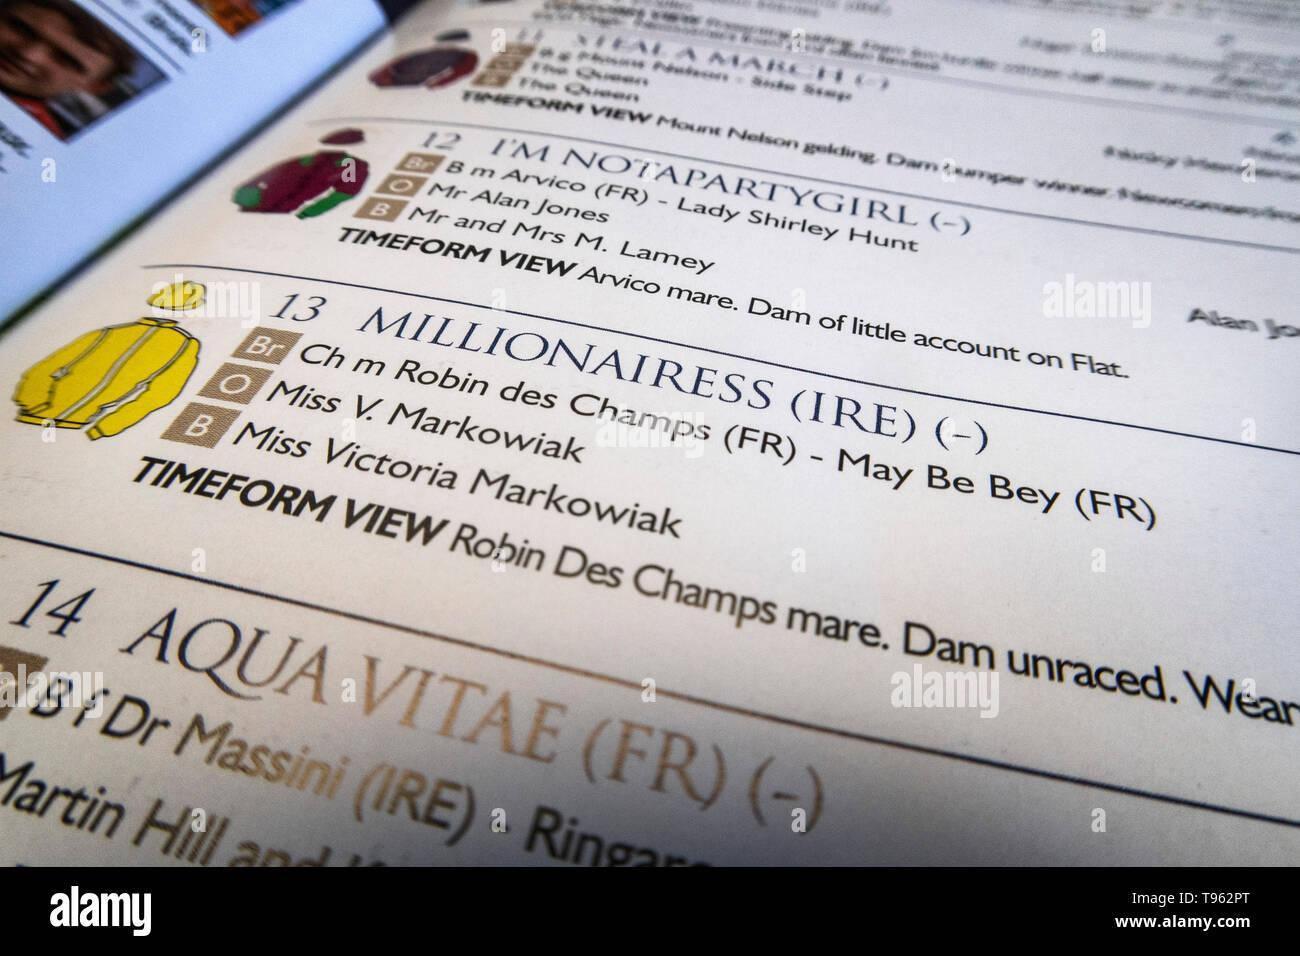 Race programme for Newton Abbot races, Devon, UK. Horse racing. - Stock Image